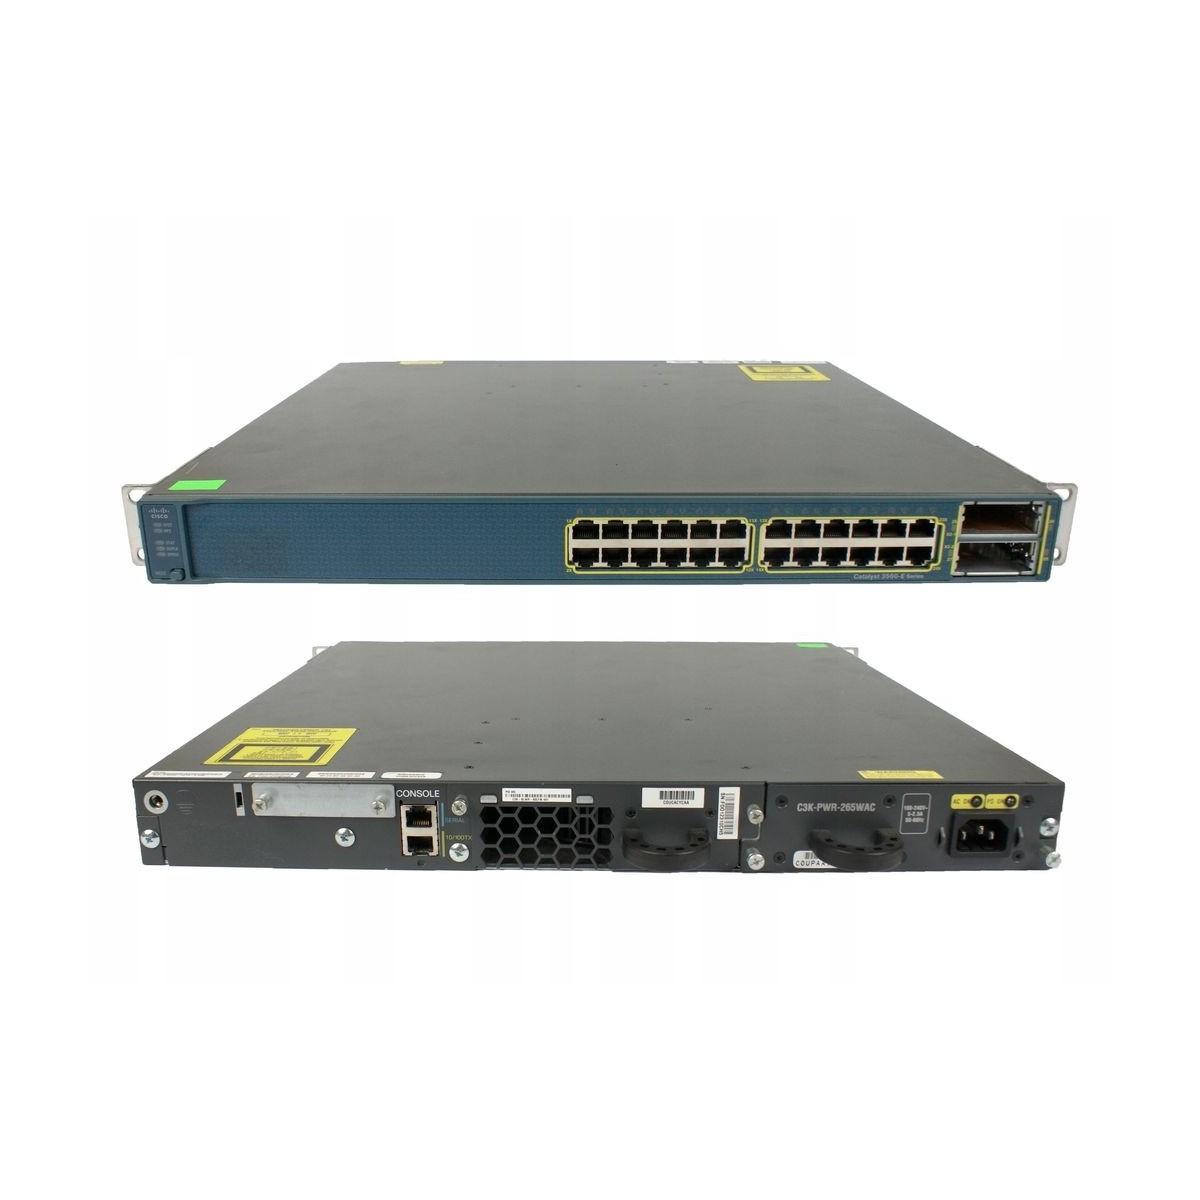 HP DL585 G6 4x2,40 SIX 128GB 3x73SAS 2x1TB SATA